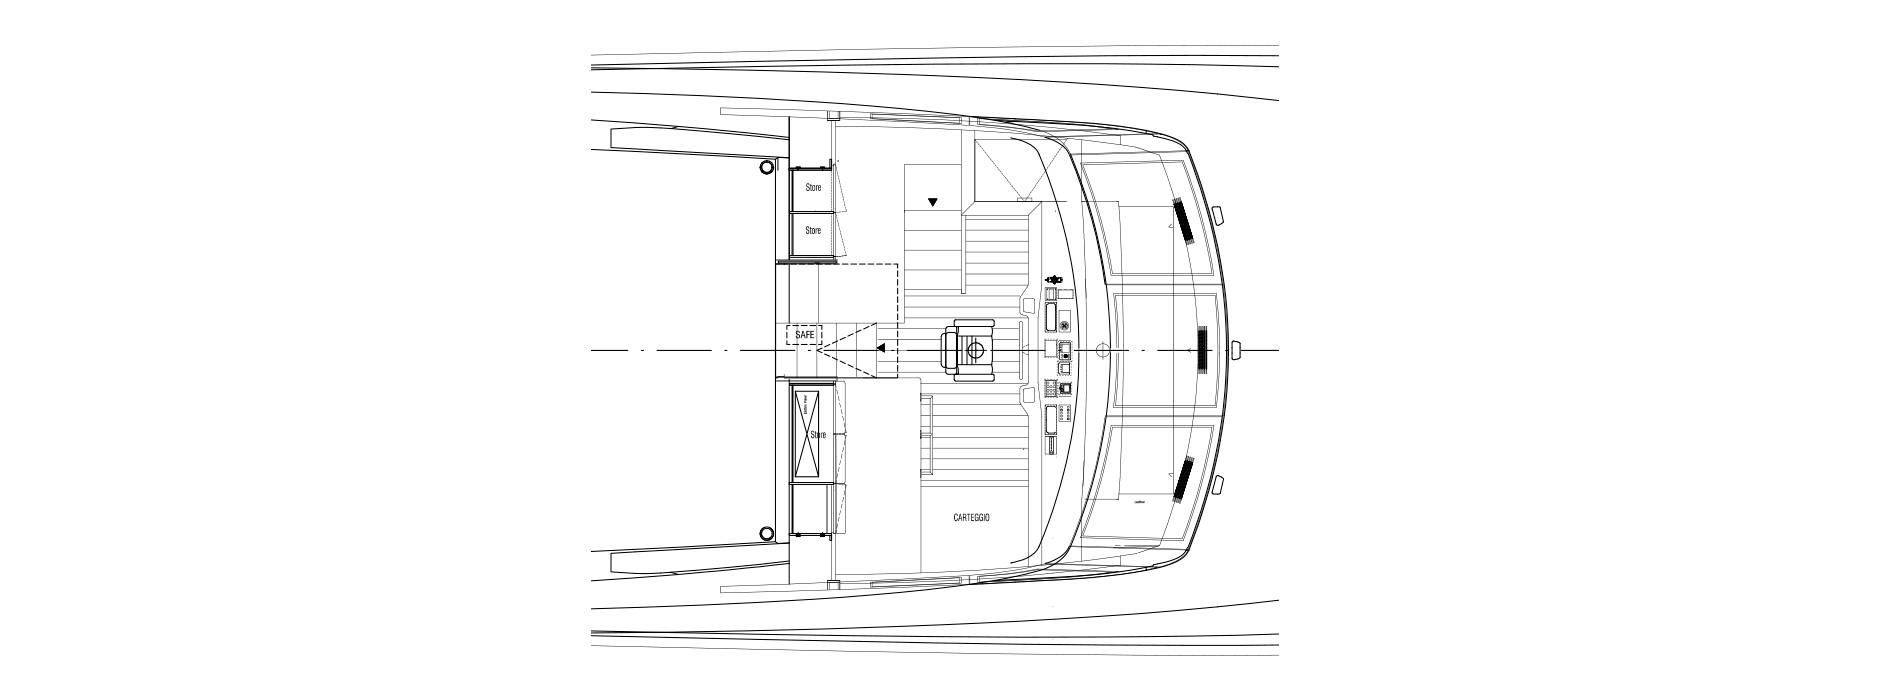 Sanlorenzo Yachts SL96-684 Detalles